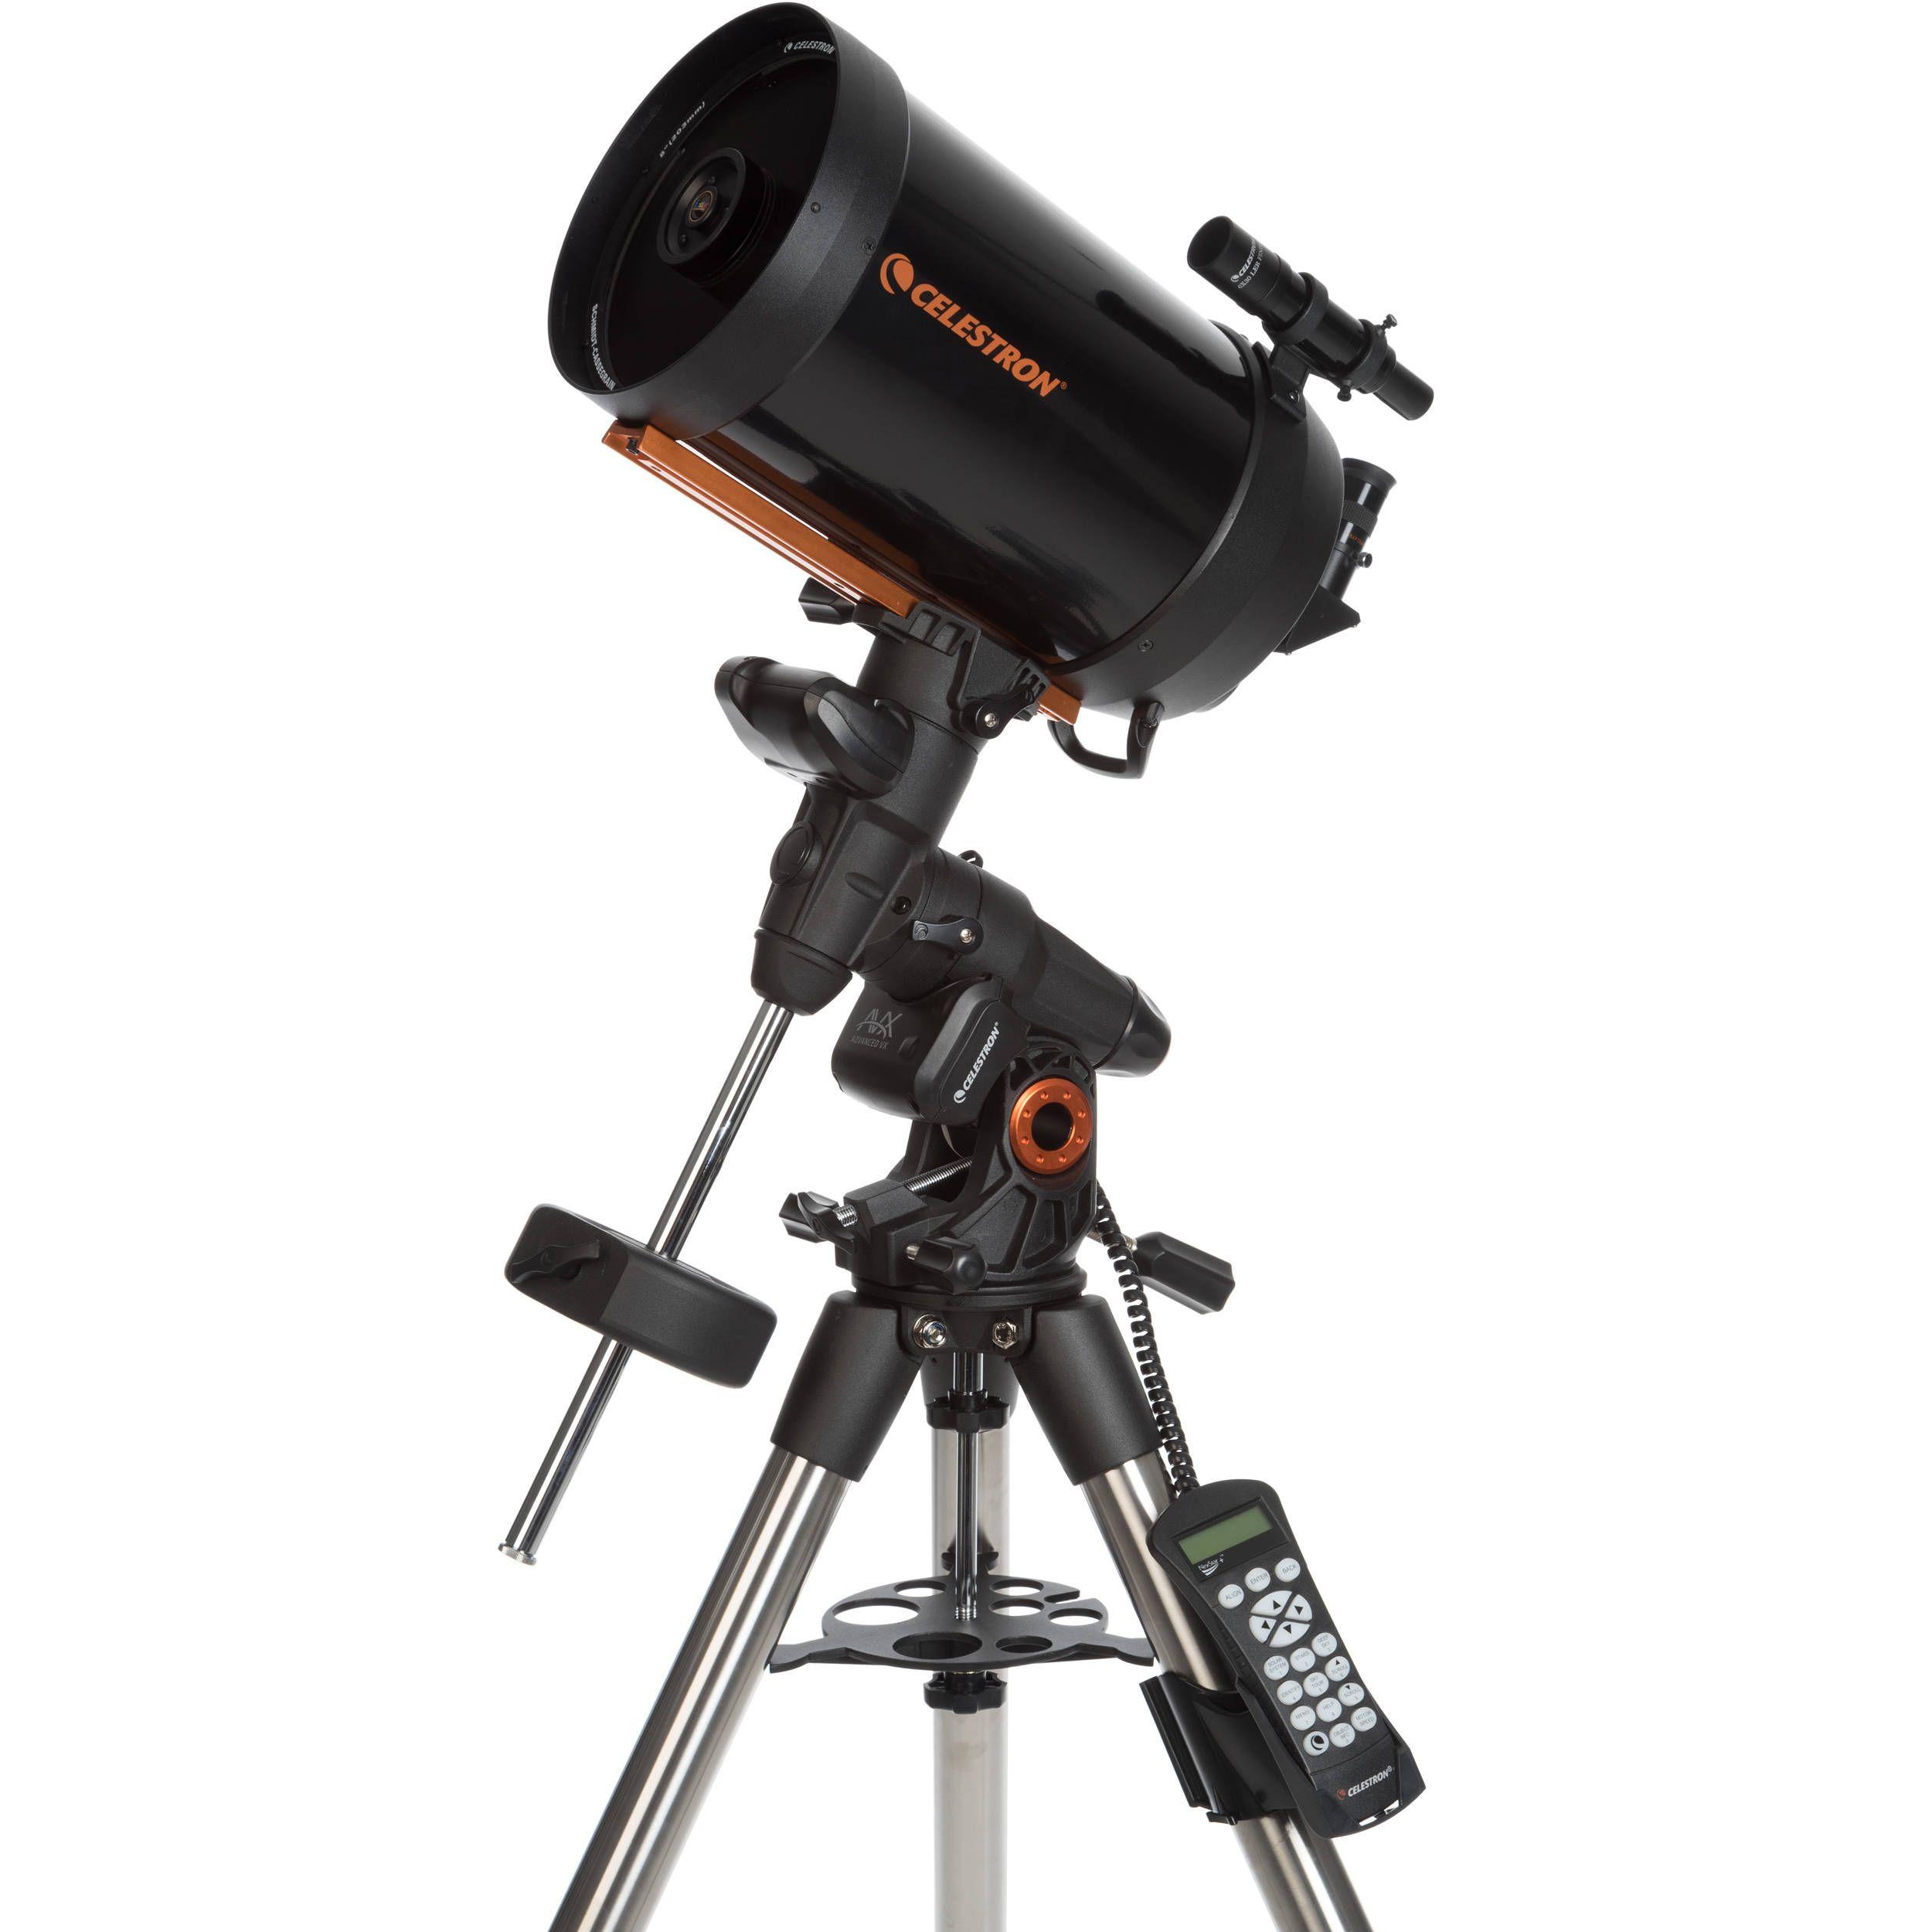 Telescopio Celestron Advanced VX Schmidt-Cassegrain